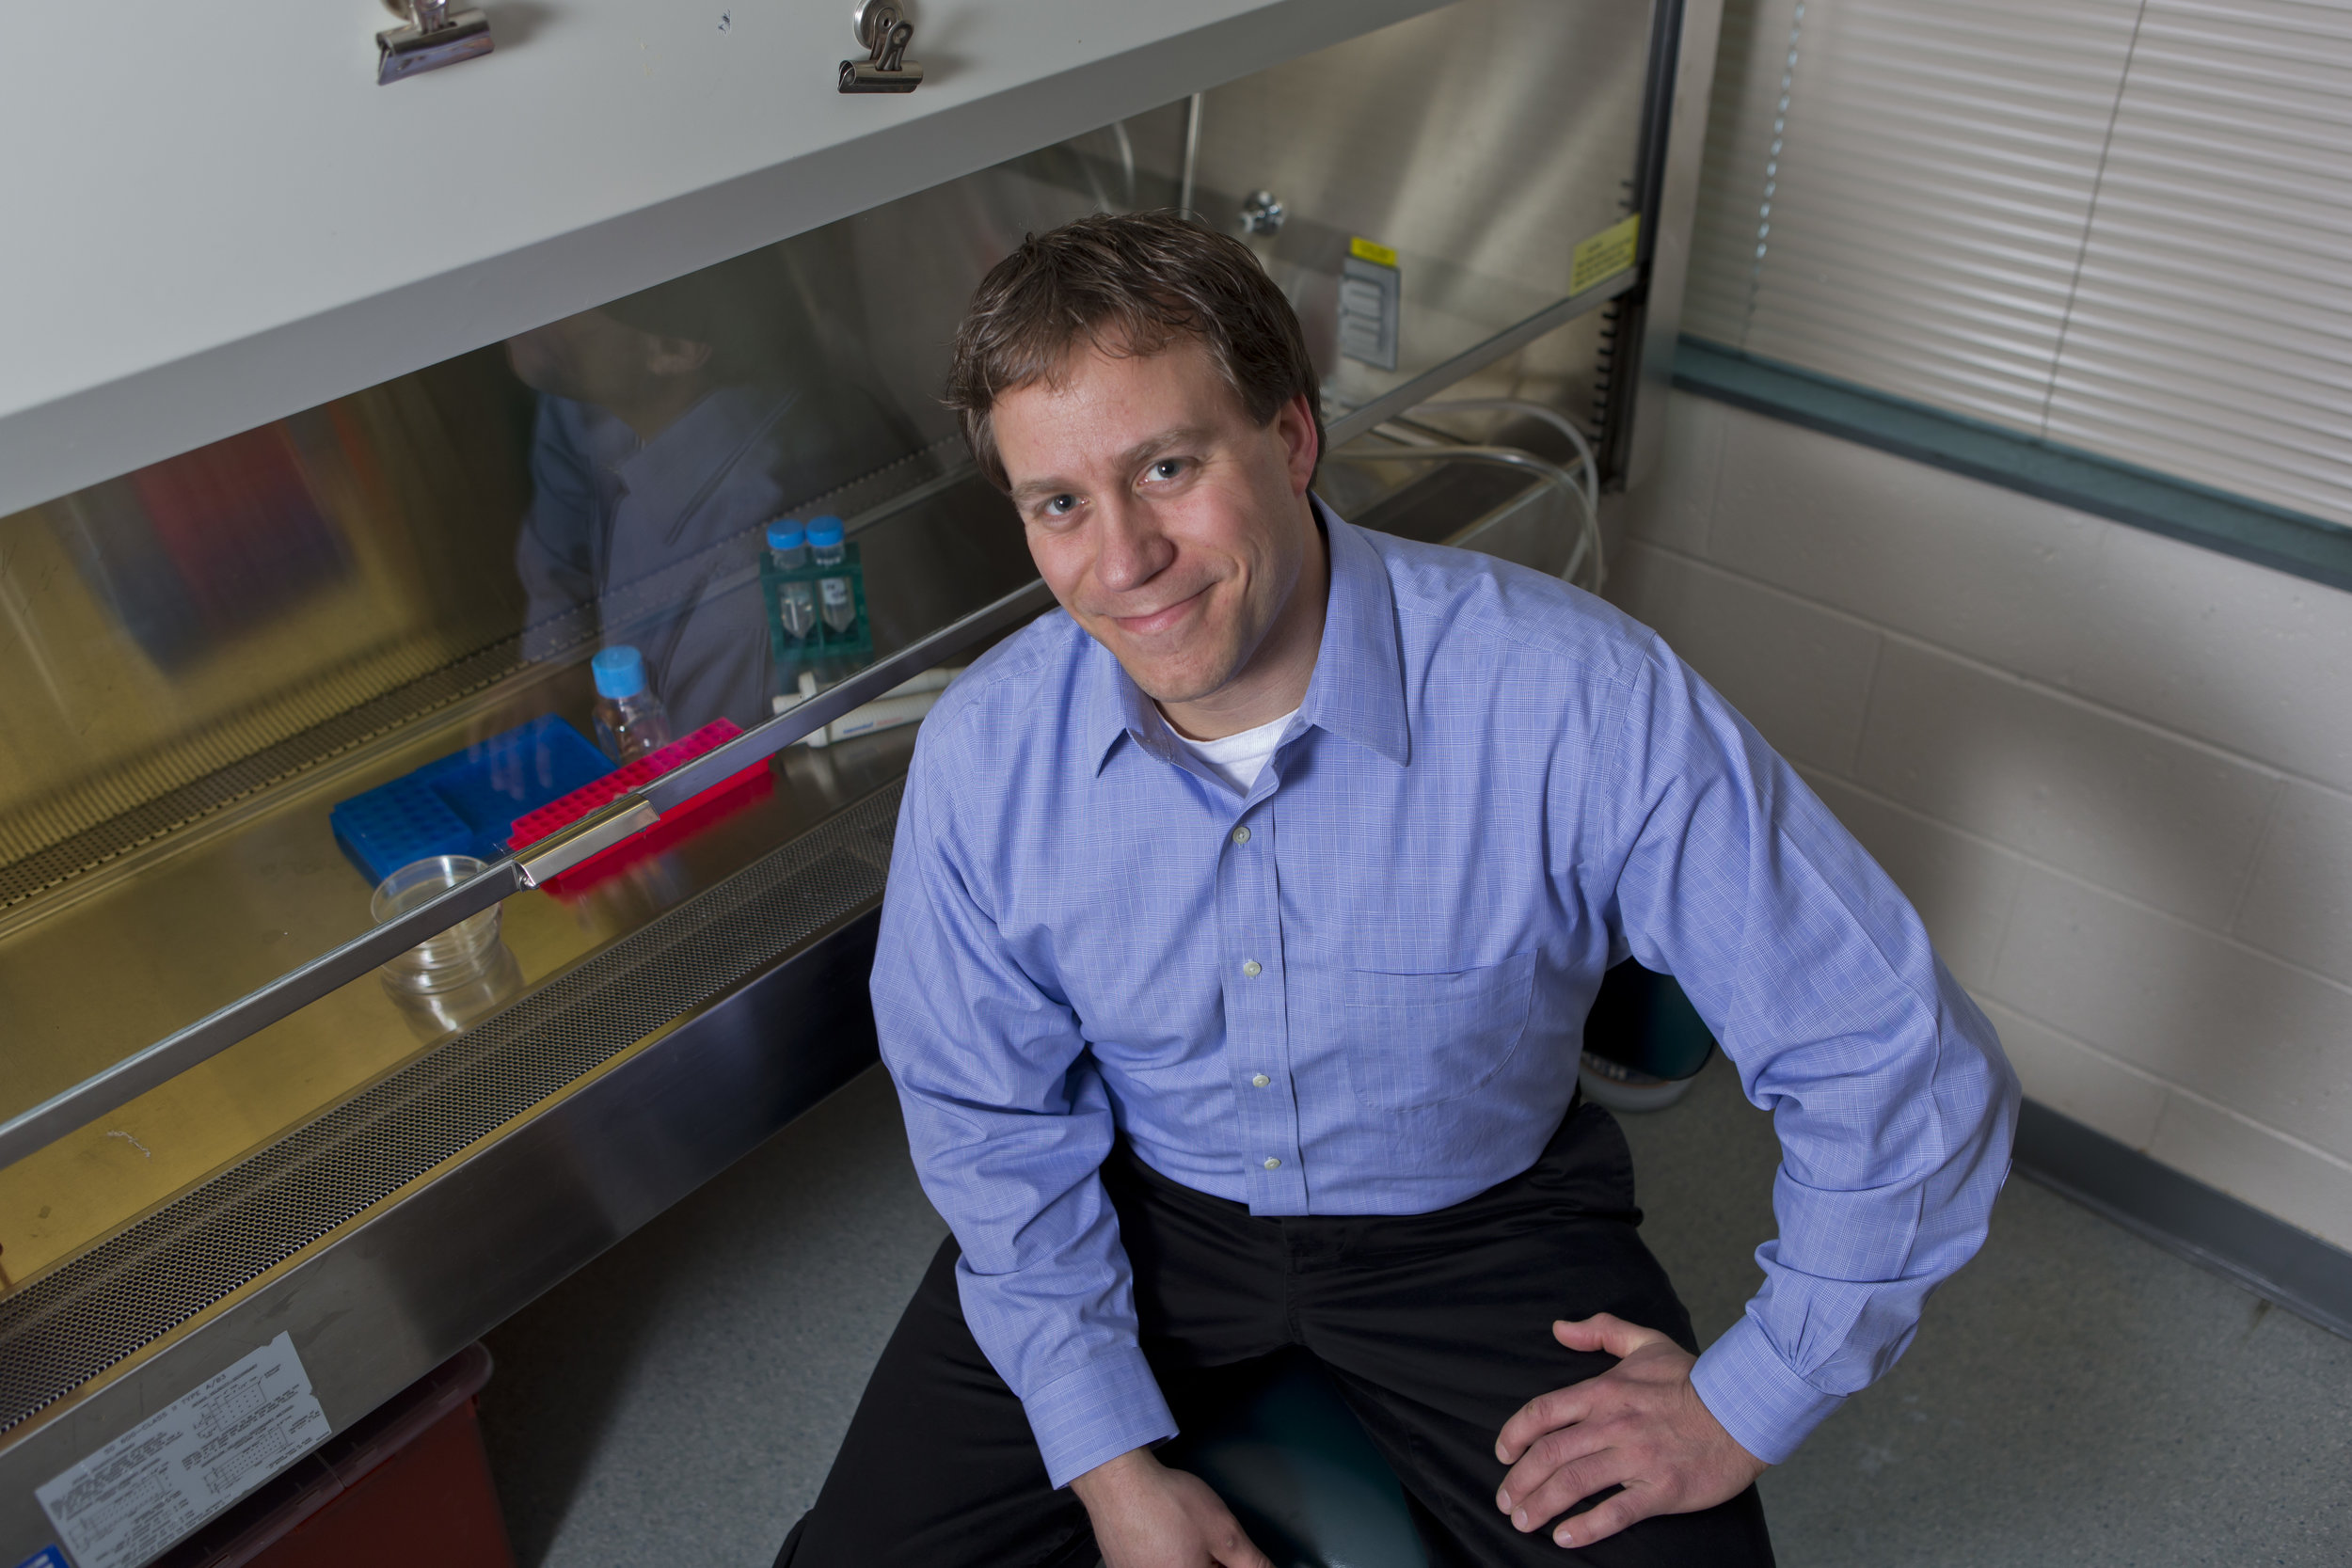 William Reiley, Ph.D.   Chief Scientific Officer at TICRO BioServices at Trudeau Institute   TICRO@trudeauinstitute.org